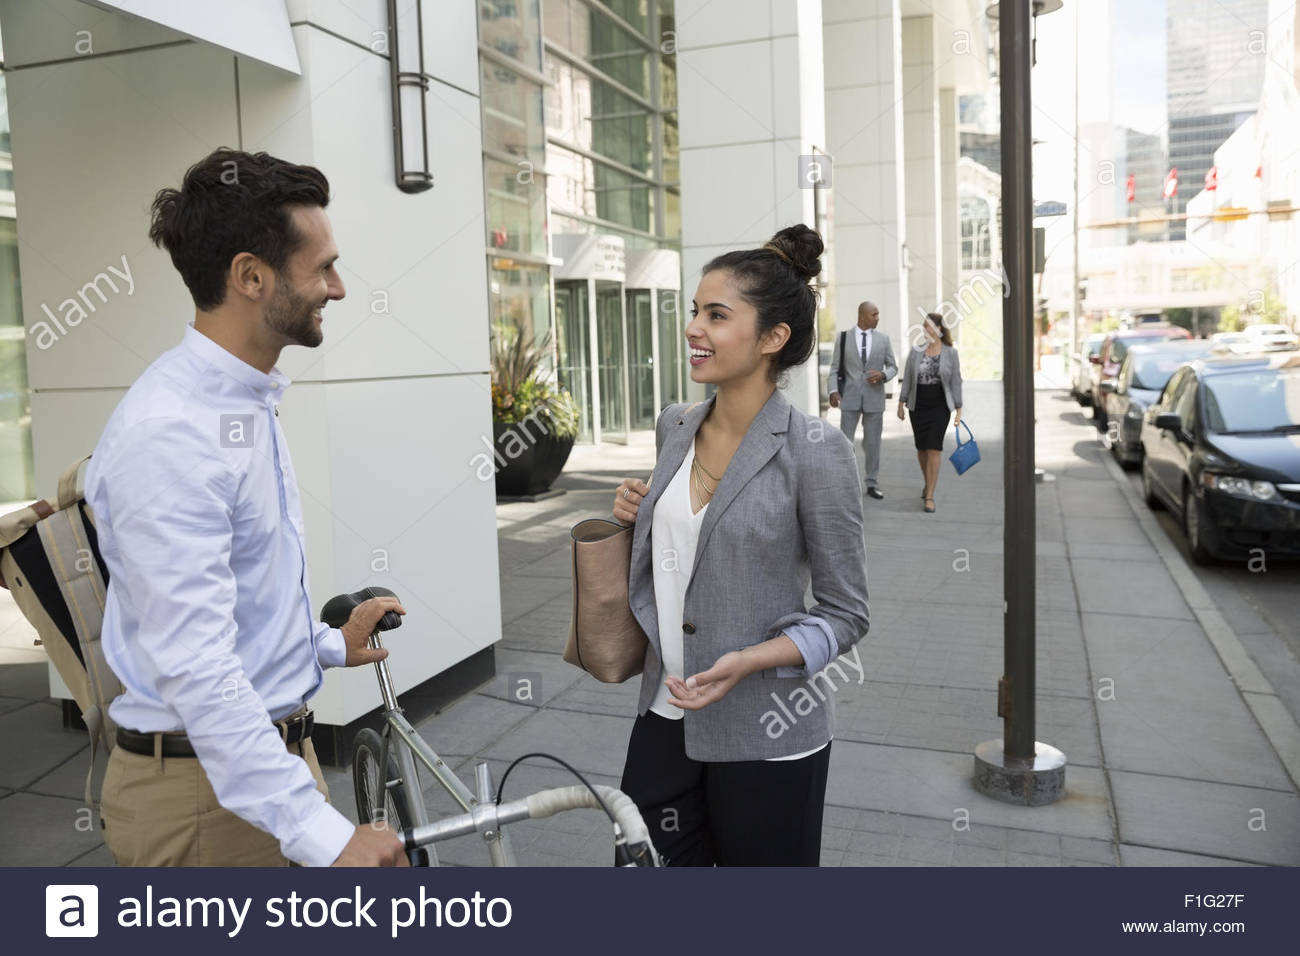 Business people talking on urban sidewalk - Stock Image